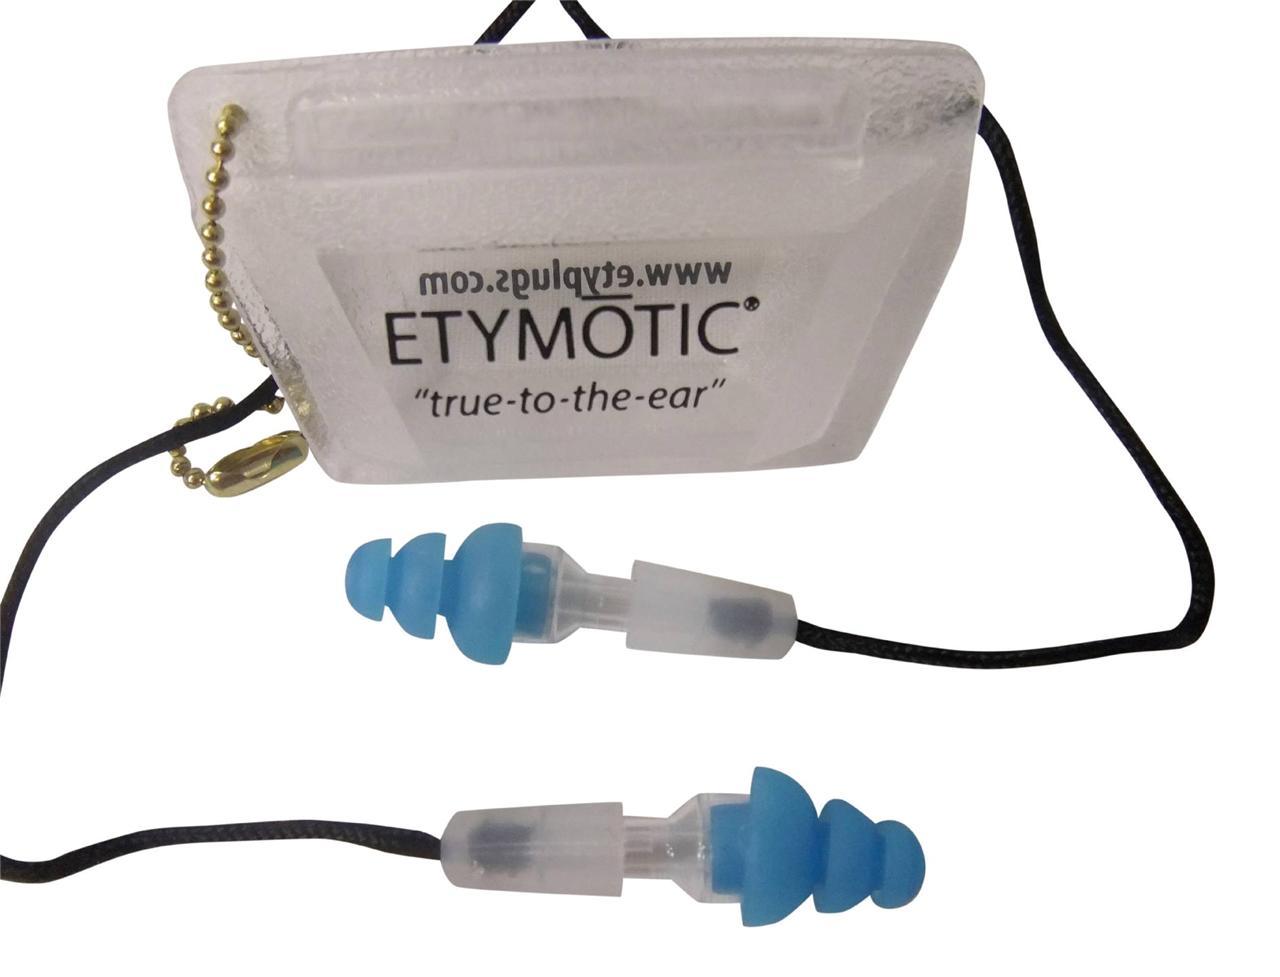 musicians earplugs etymotic research er20 smb c hi fi standard fit reusable blue ebay. Black Bedroom Furniture Sets. Home Design Ideas